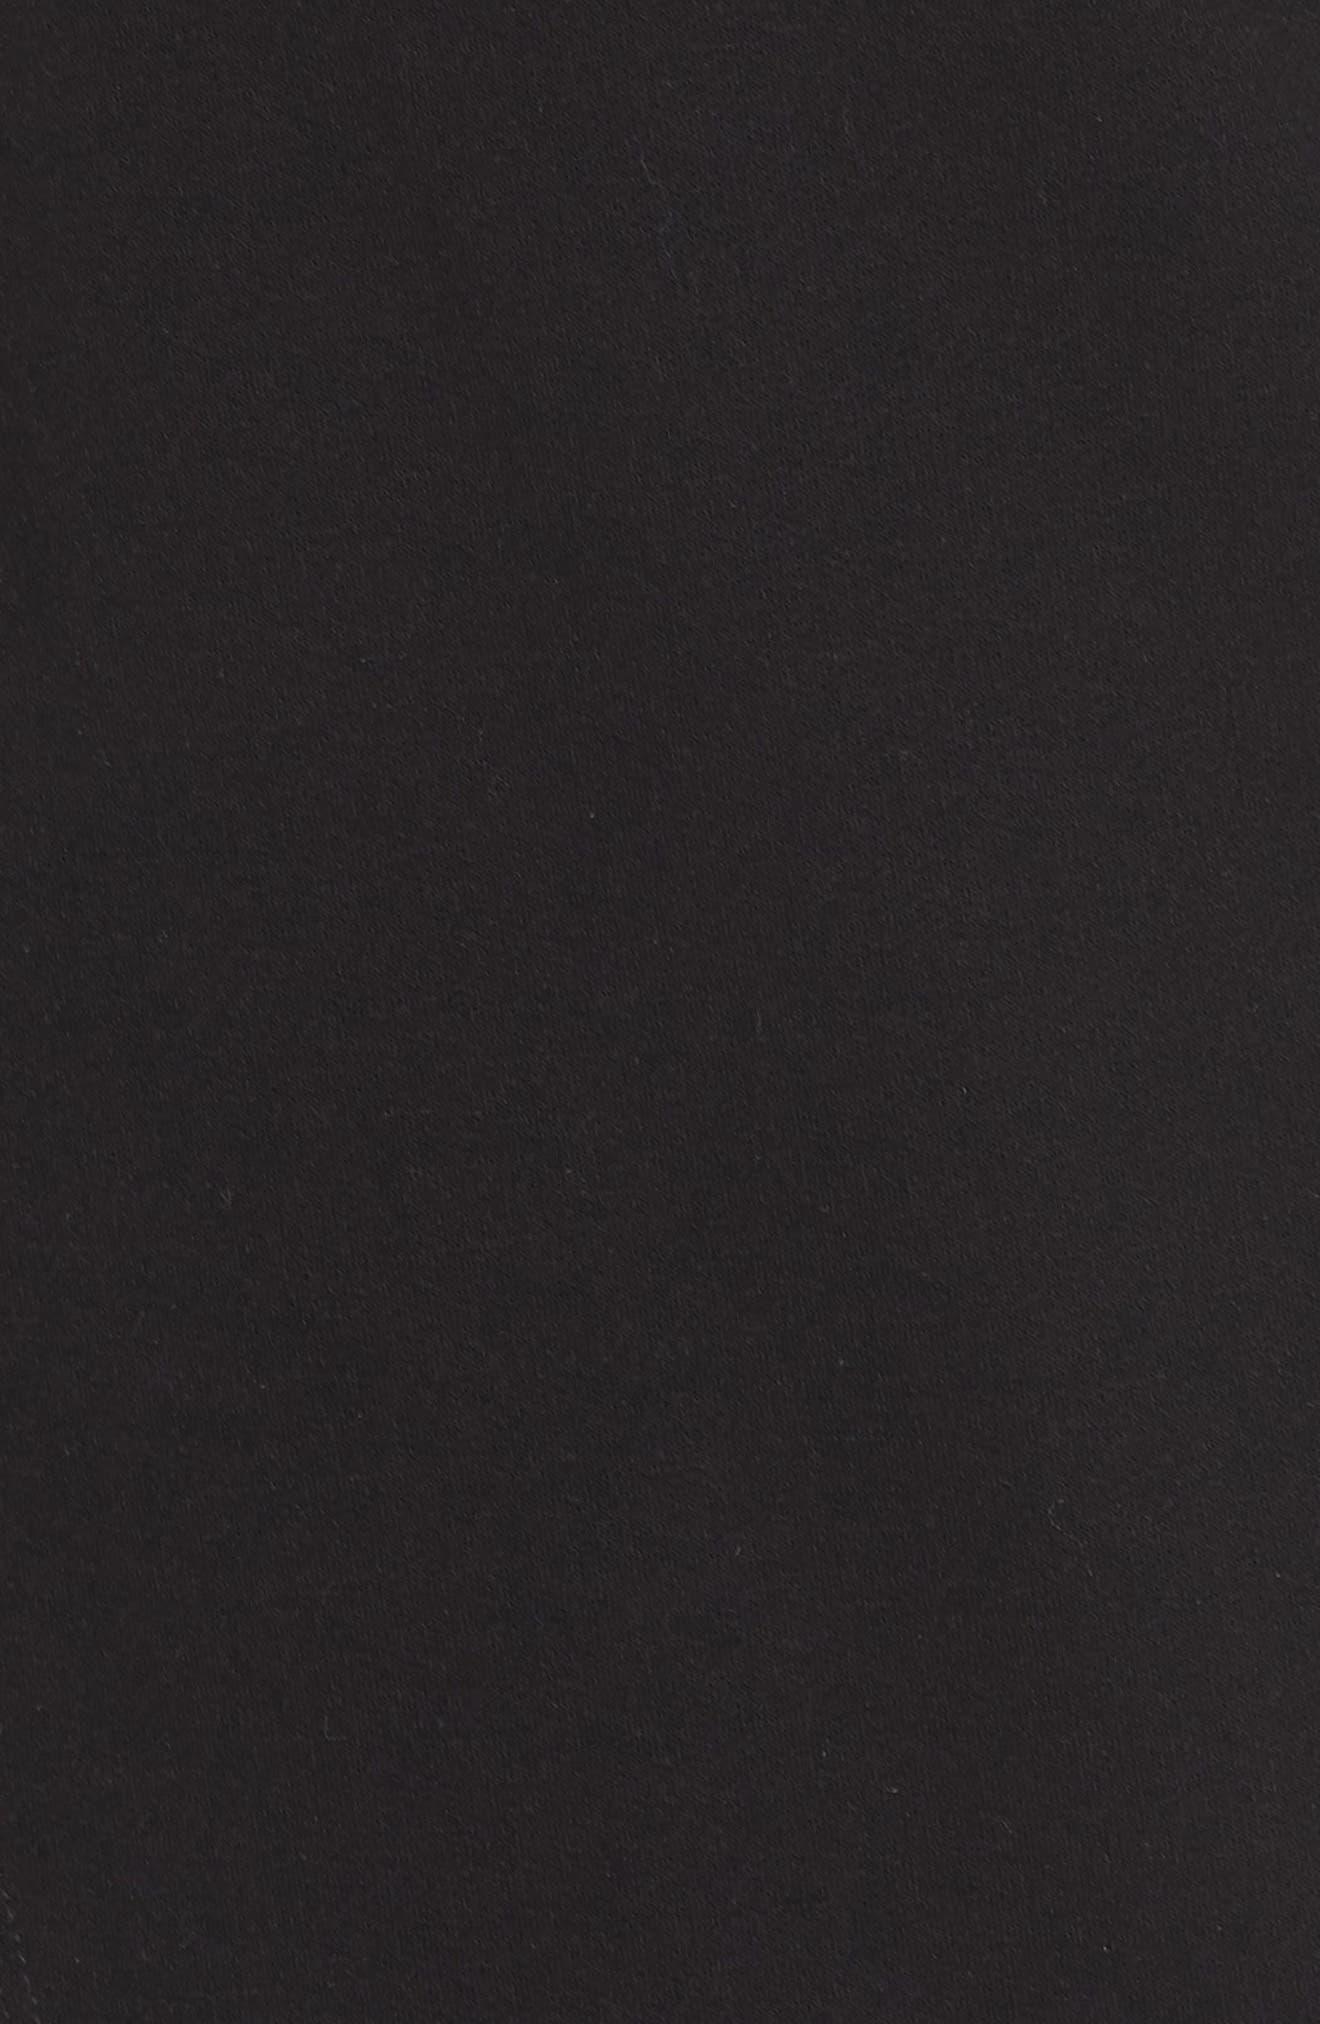 Off-Duty Fleece Knit Cardigan,                             Alternate thumbnail 6, color,                             001